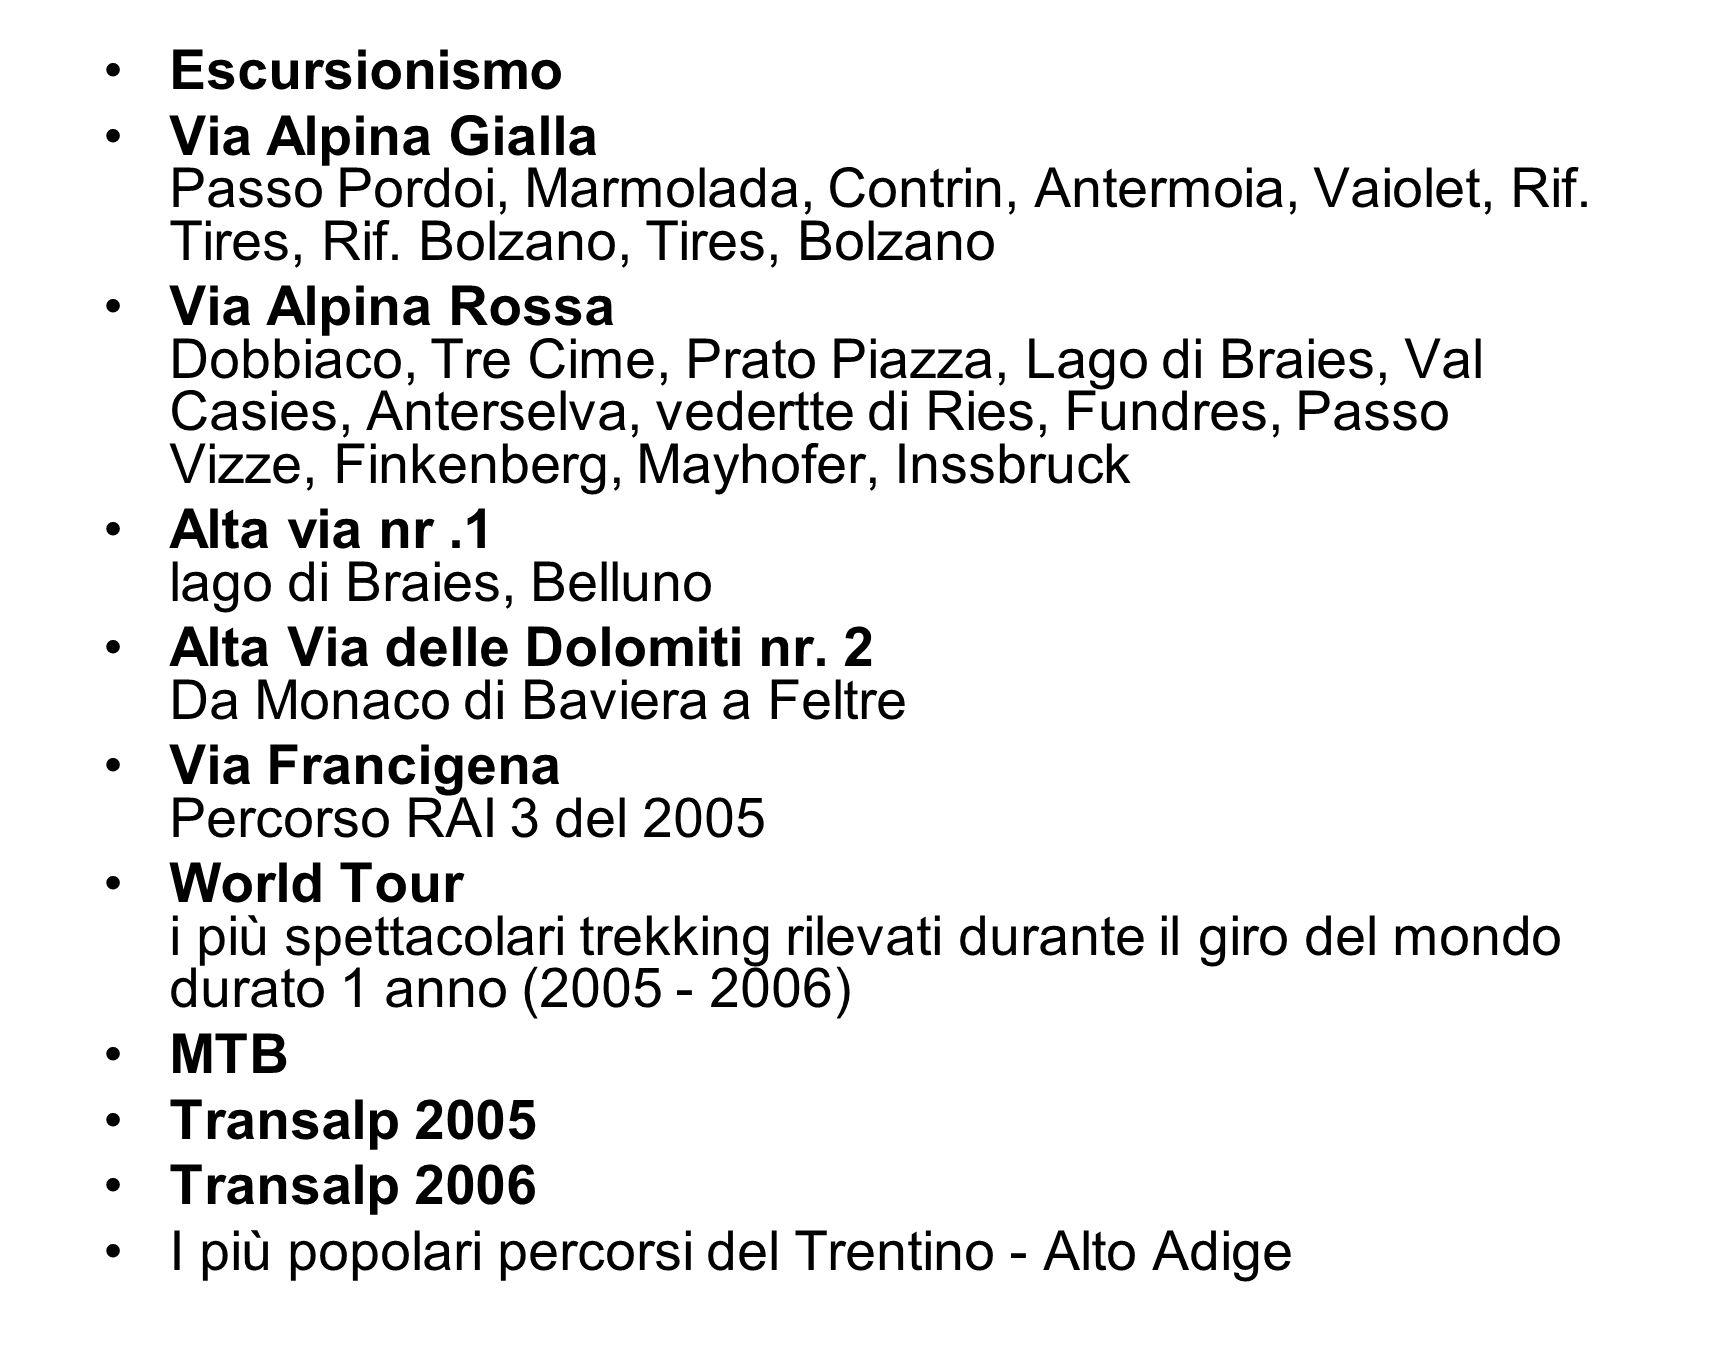 Escursionismo Via Alpina Gialla Passo Pordoi, Marmolada, Contrin, Antermoia, Vaiolet, Rif. Tires, Rif. Bolzano, Tires, Bolzano.